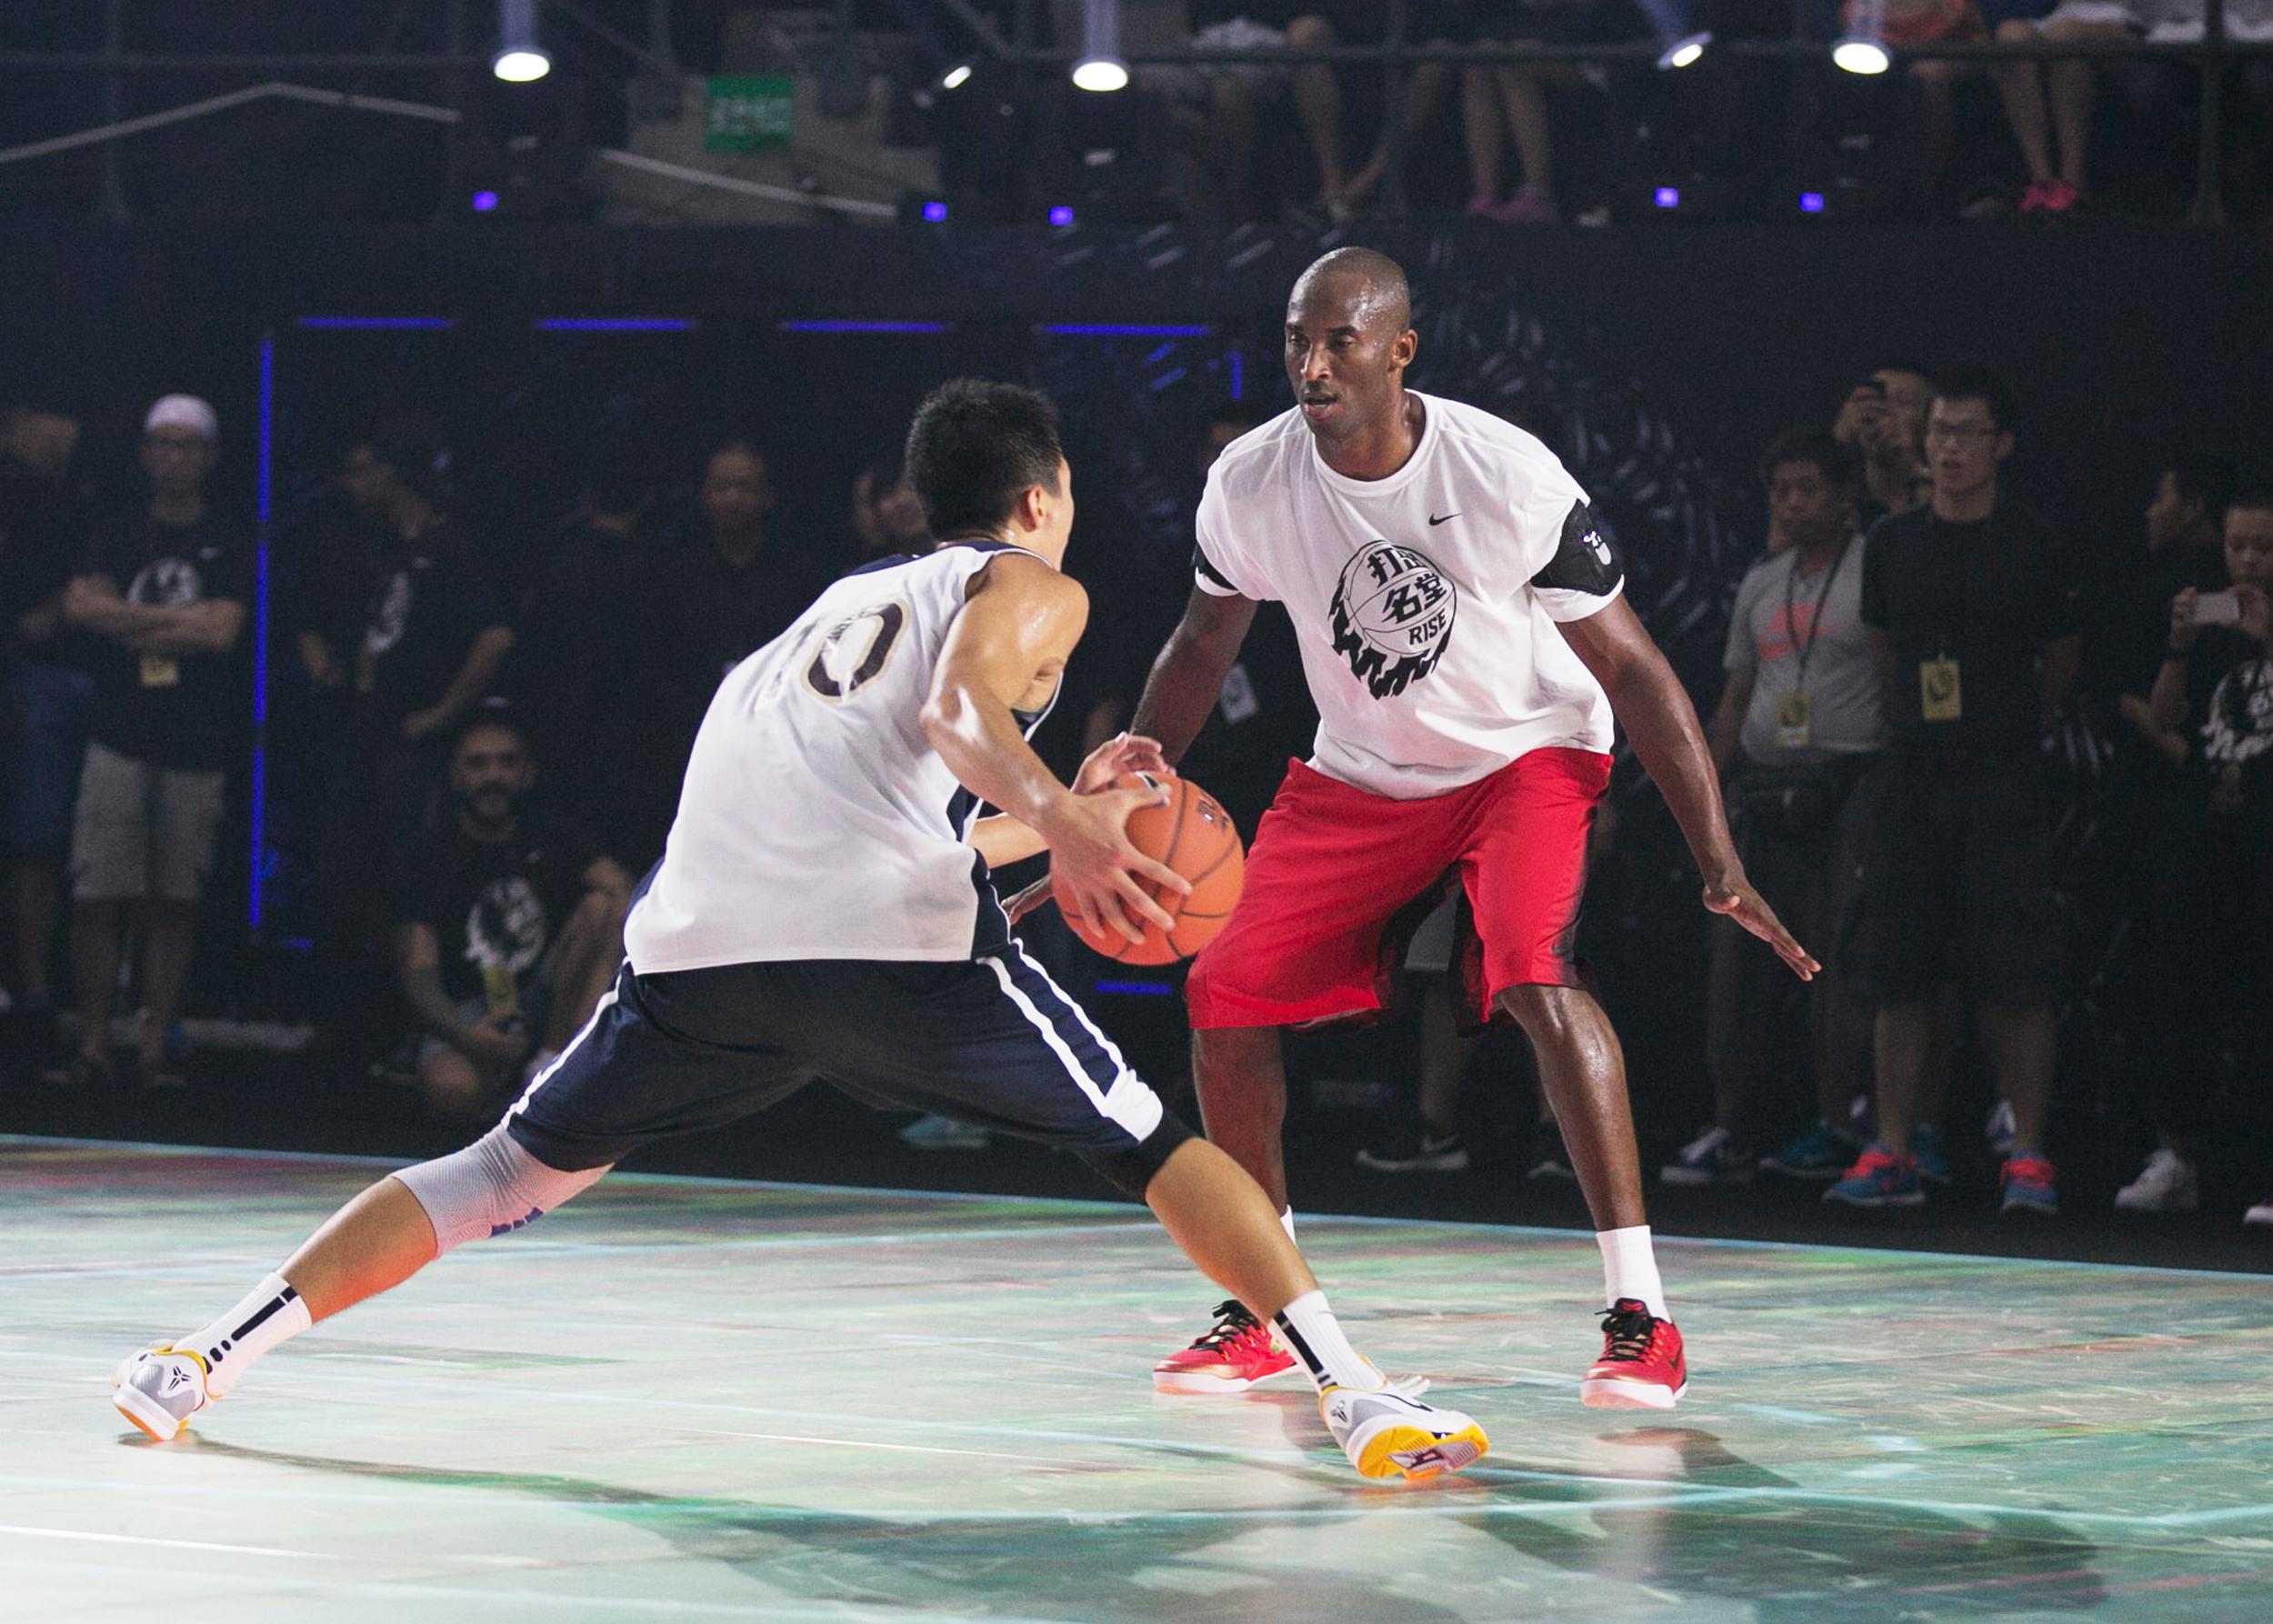 nike-kobe-bryant-china-tour-2014-tron-like-led-digital-basketball-court-07.jpg